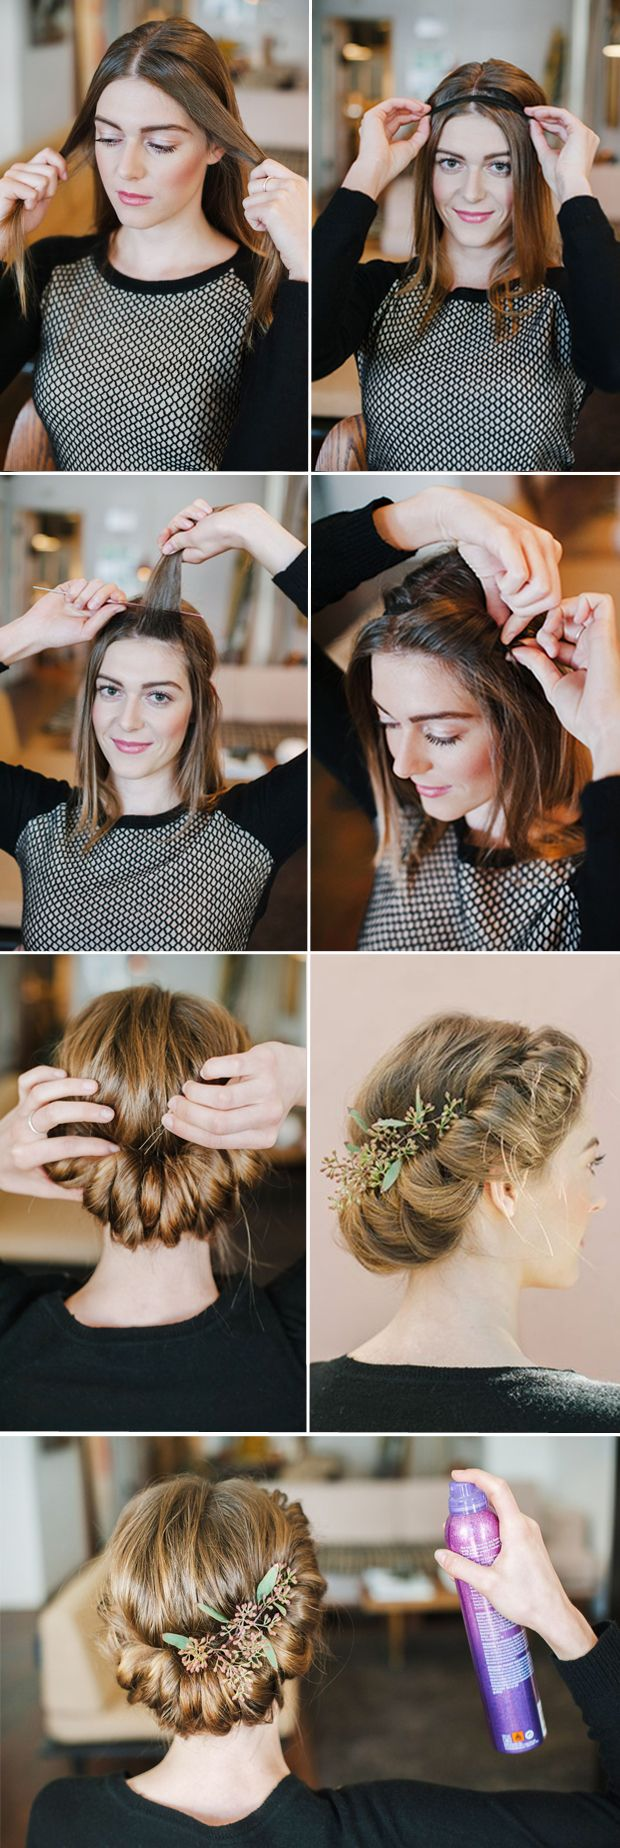 10 best diy wedding hairstyles with tutorials | beauty | pinterest